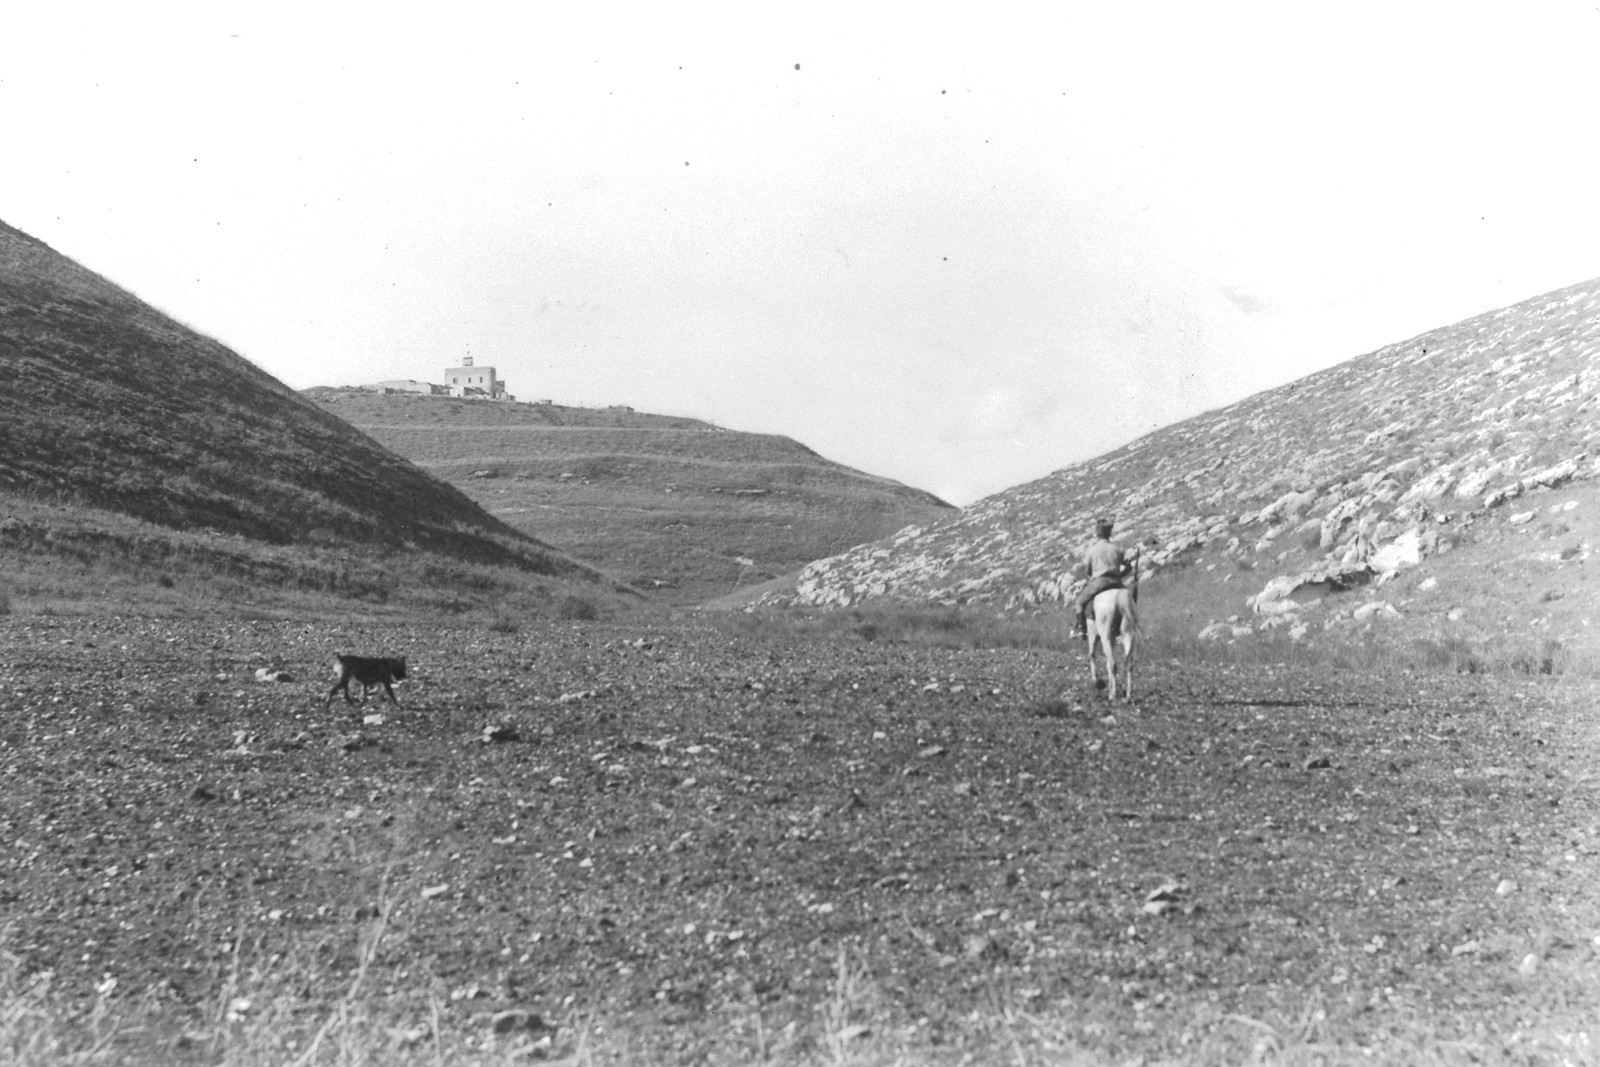 1937. Поля вокруг кибуца Эйн-А-Шофет